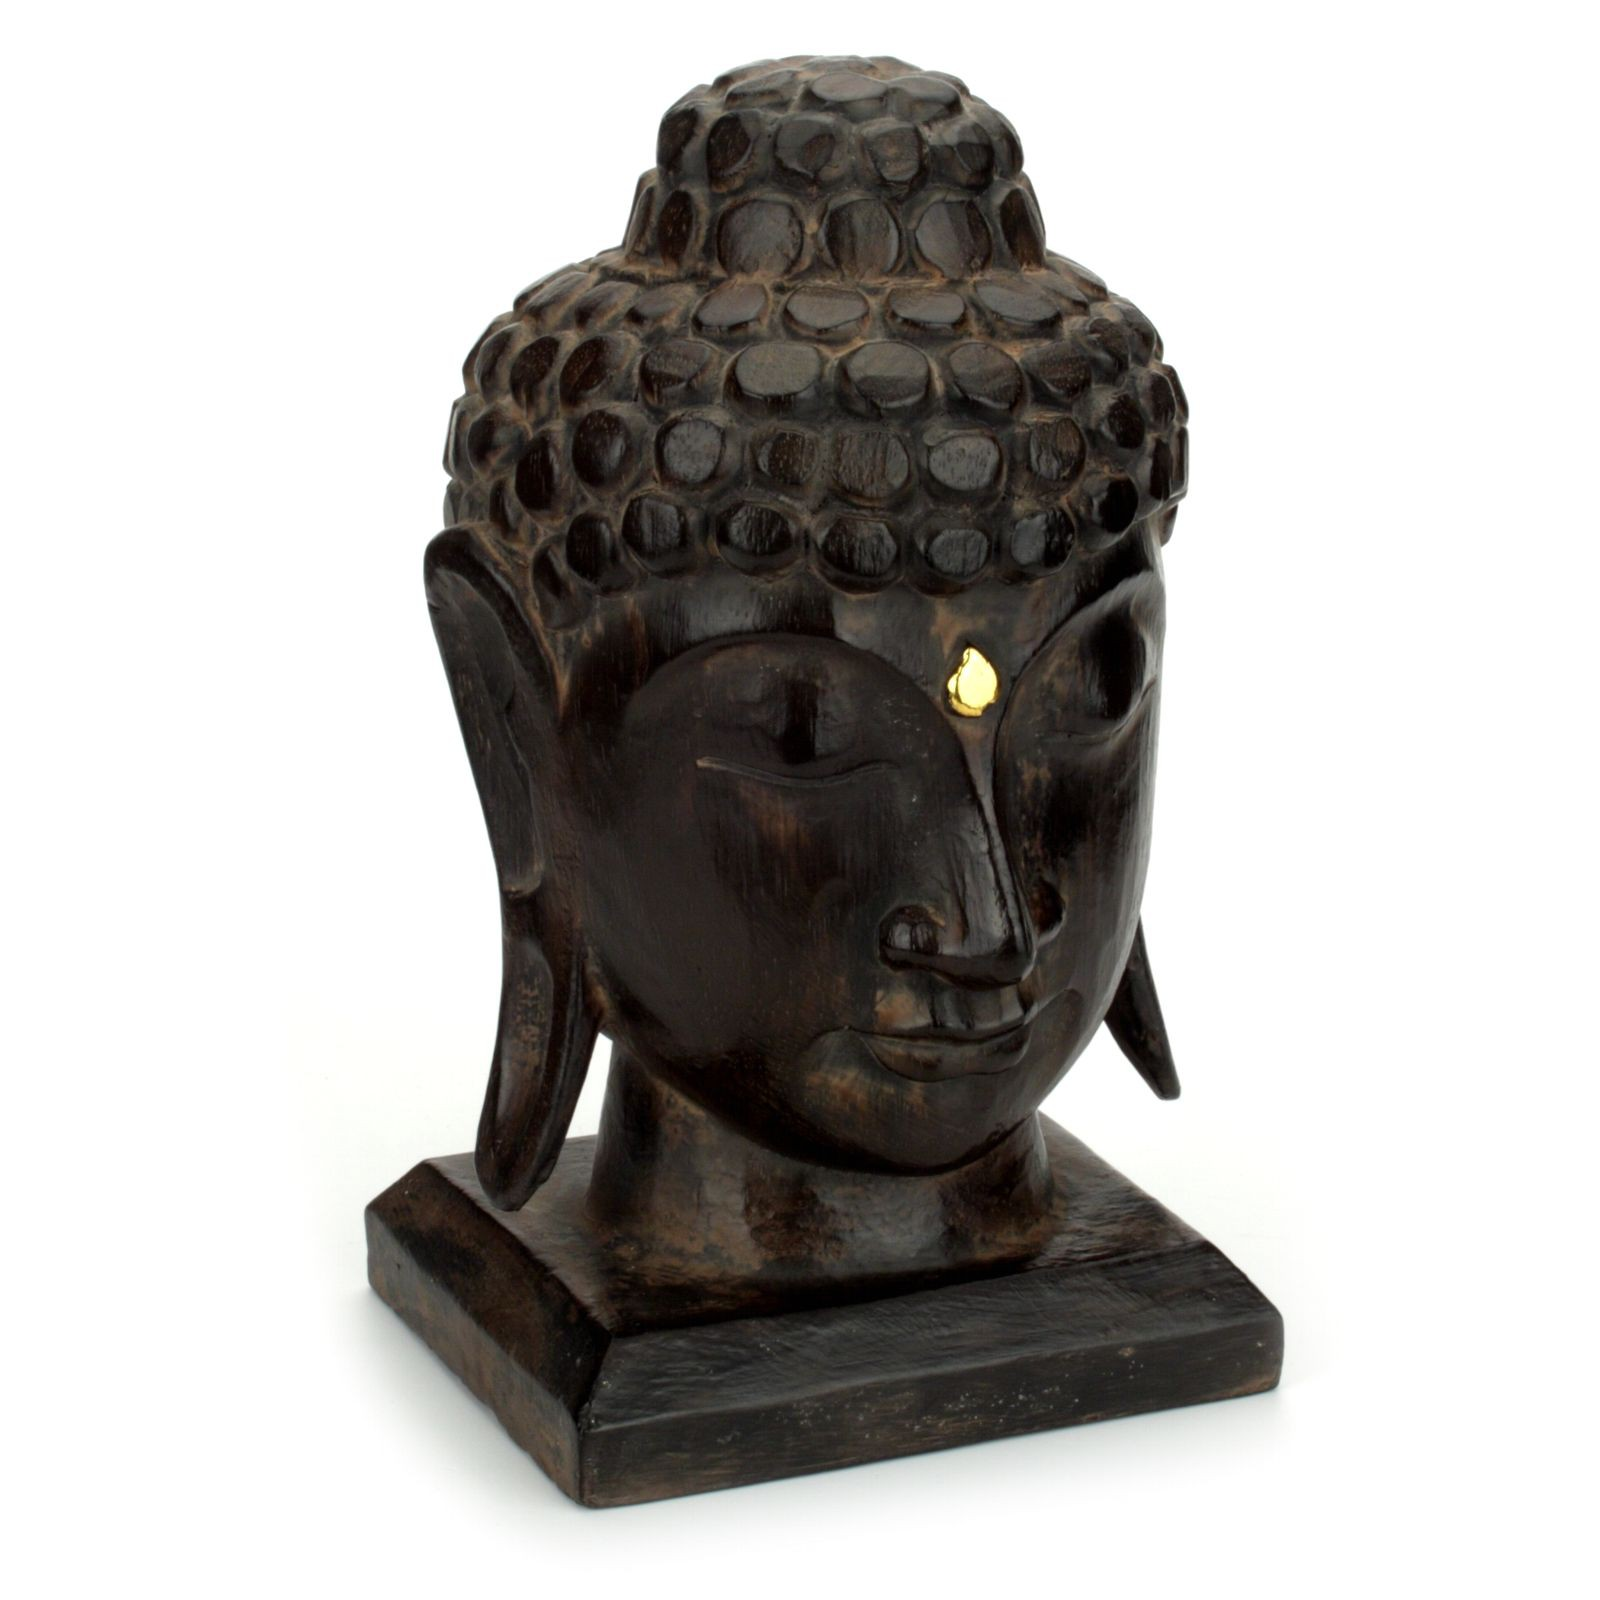 buddha kopf figur aus holz gr s 25 cm ebenholzfarben 119192. Black Bedroom Furniture Sets. Home Design Ideas